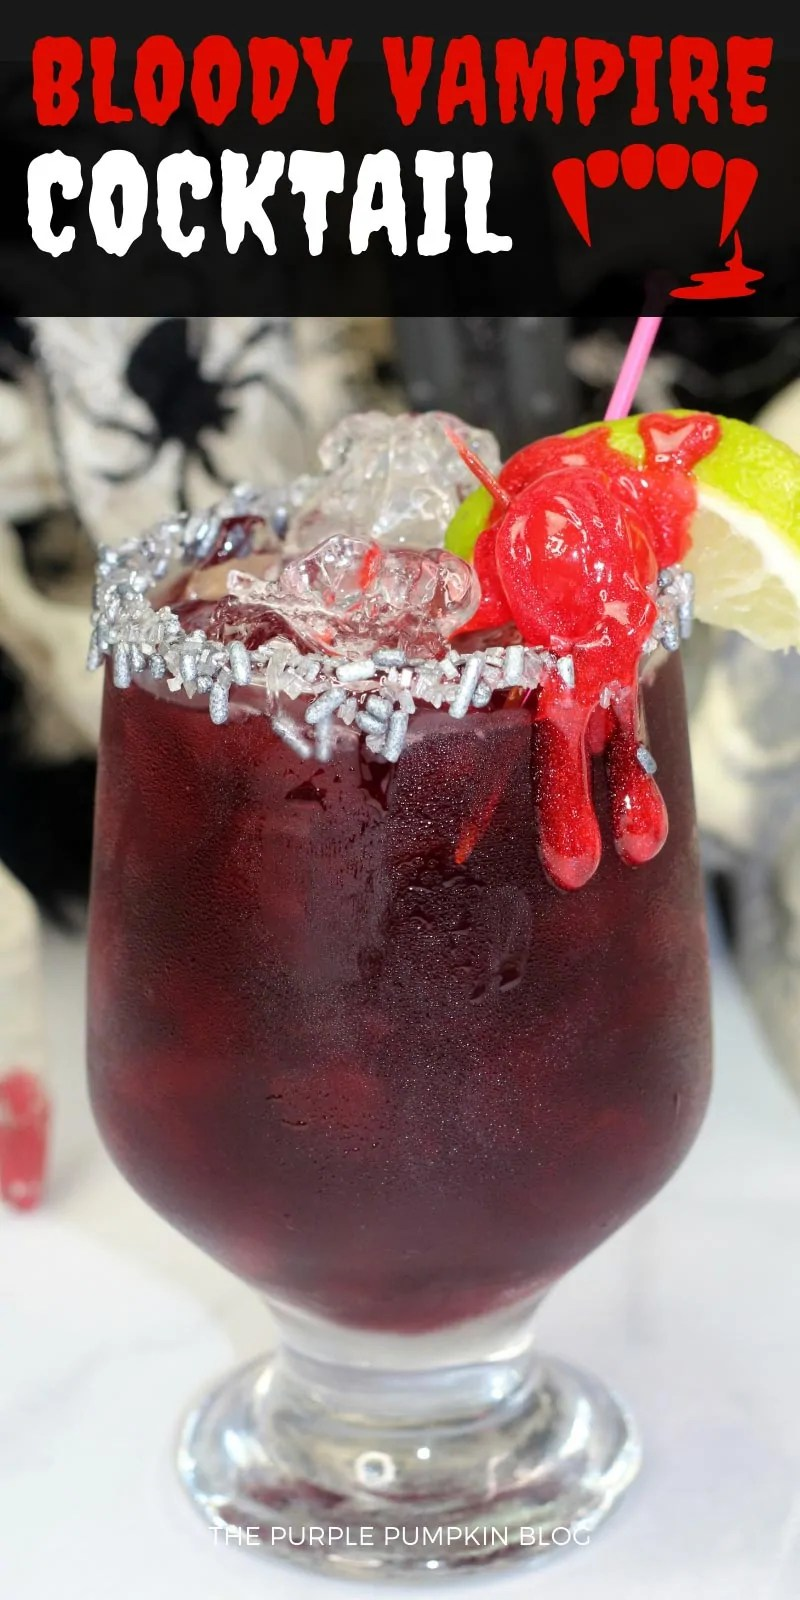 Vampire Blood cocktail